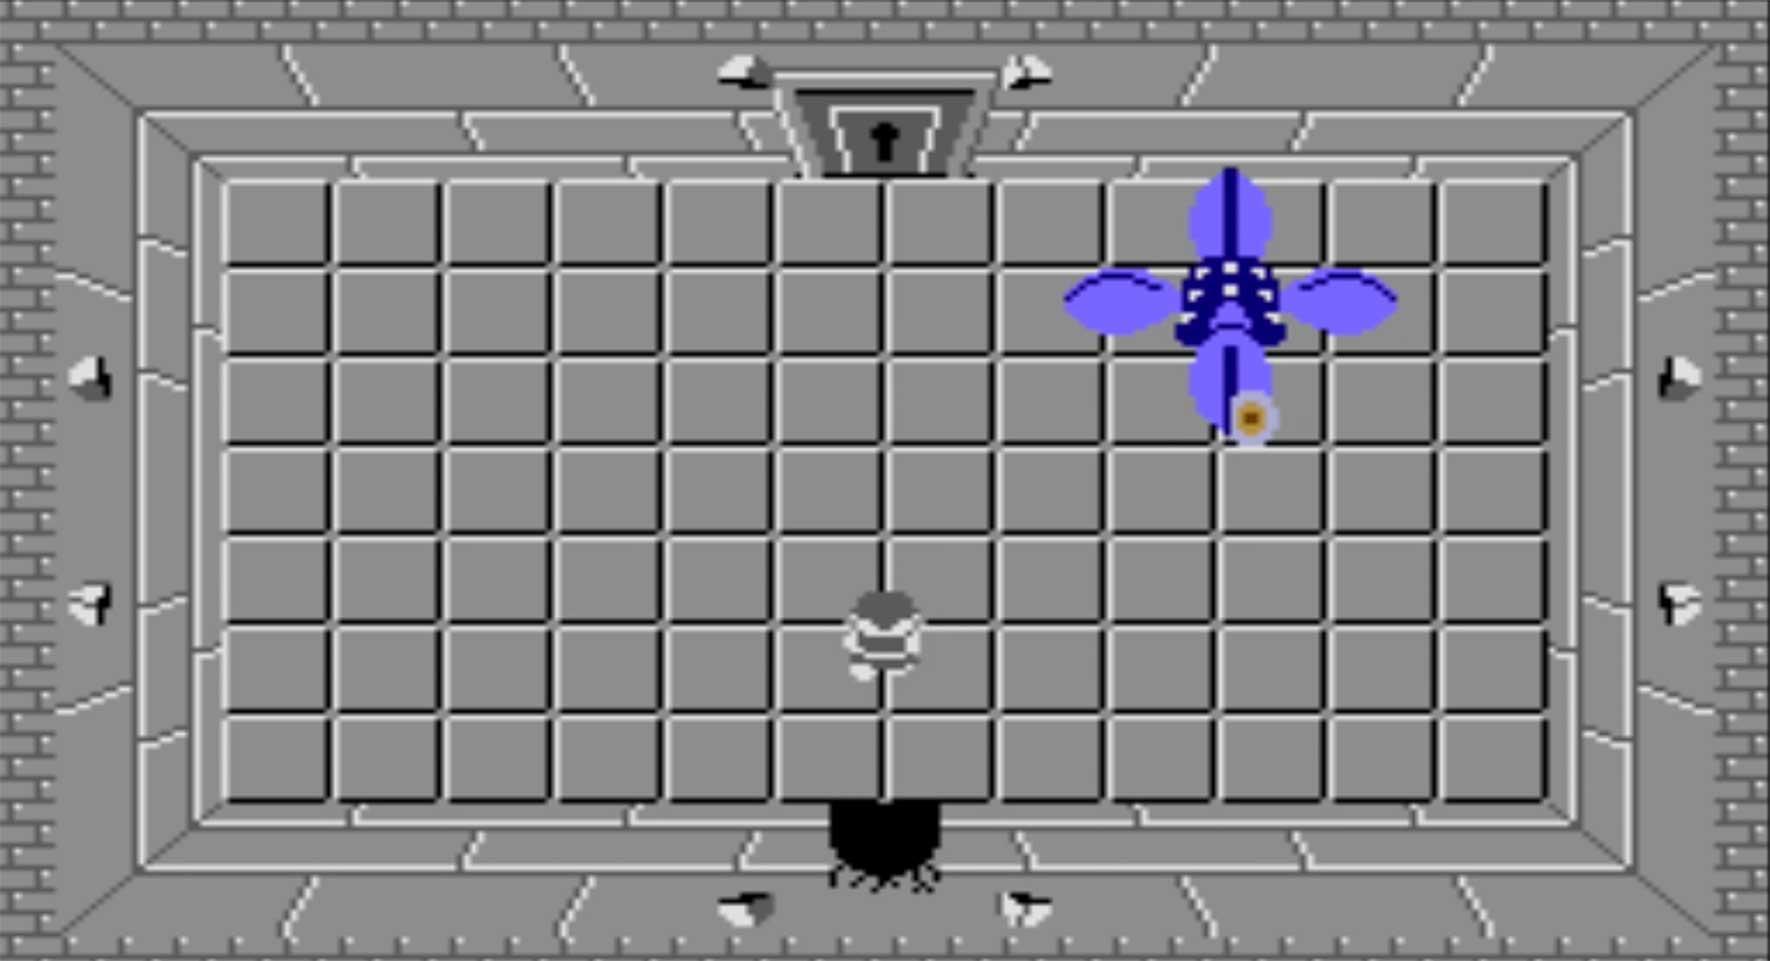 Legend Of Zelda Level 6 Dungeon Map | Wiring Diagram Database